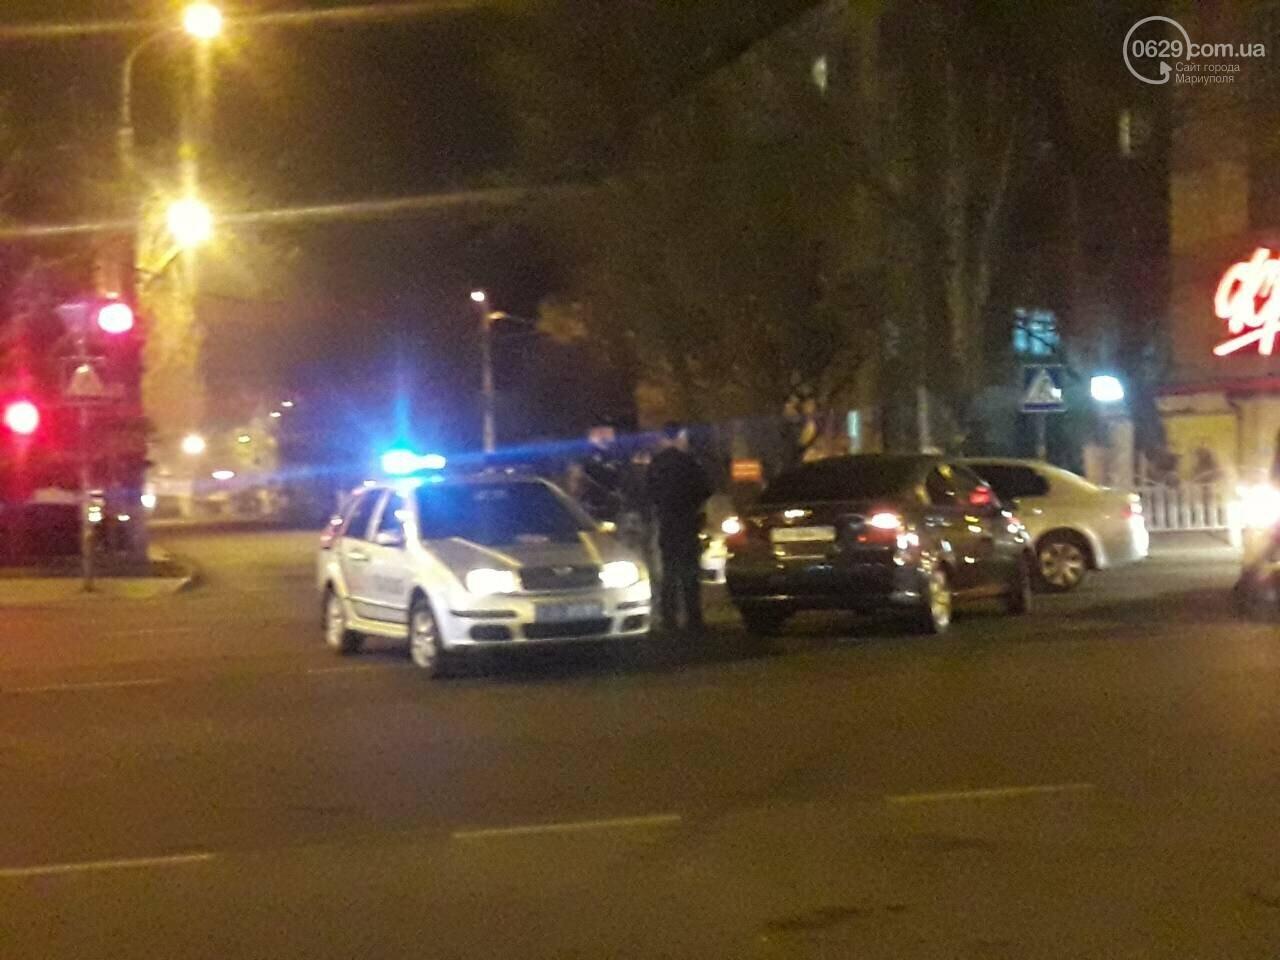 В центре Мариуполя столкнулись два автомобиля, — ФОТО, фото-5